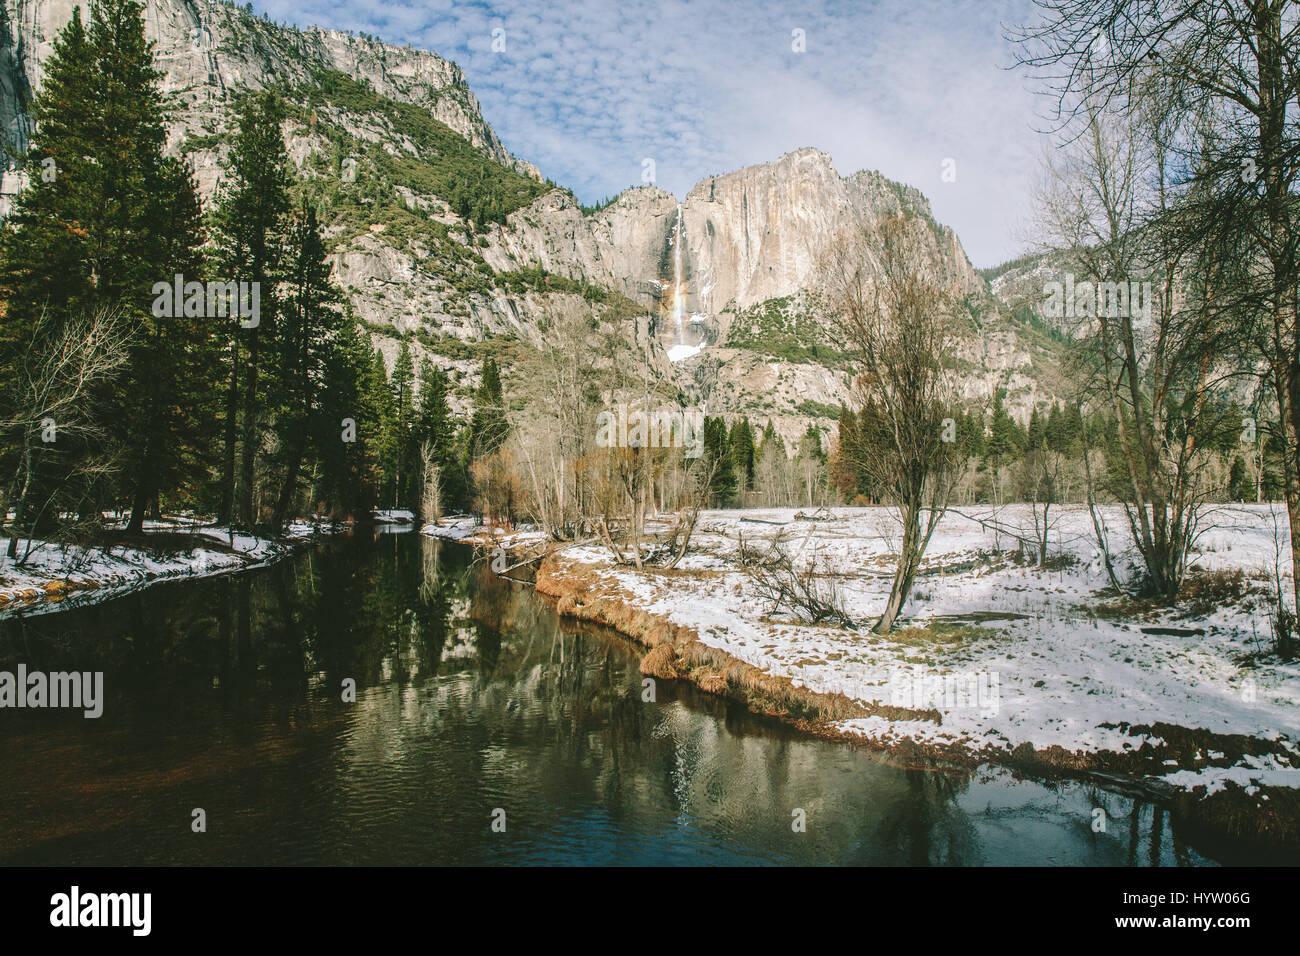 Yosemite Falls at Yosemite, California, USA - Stock Image